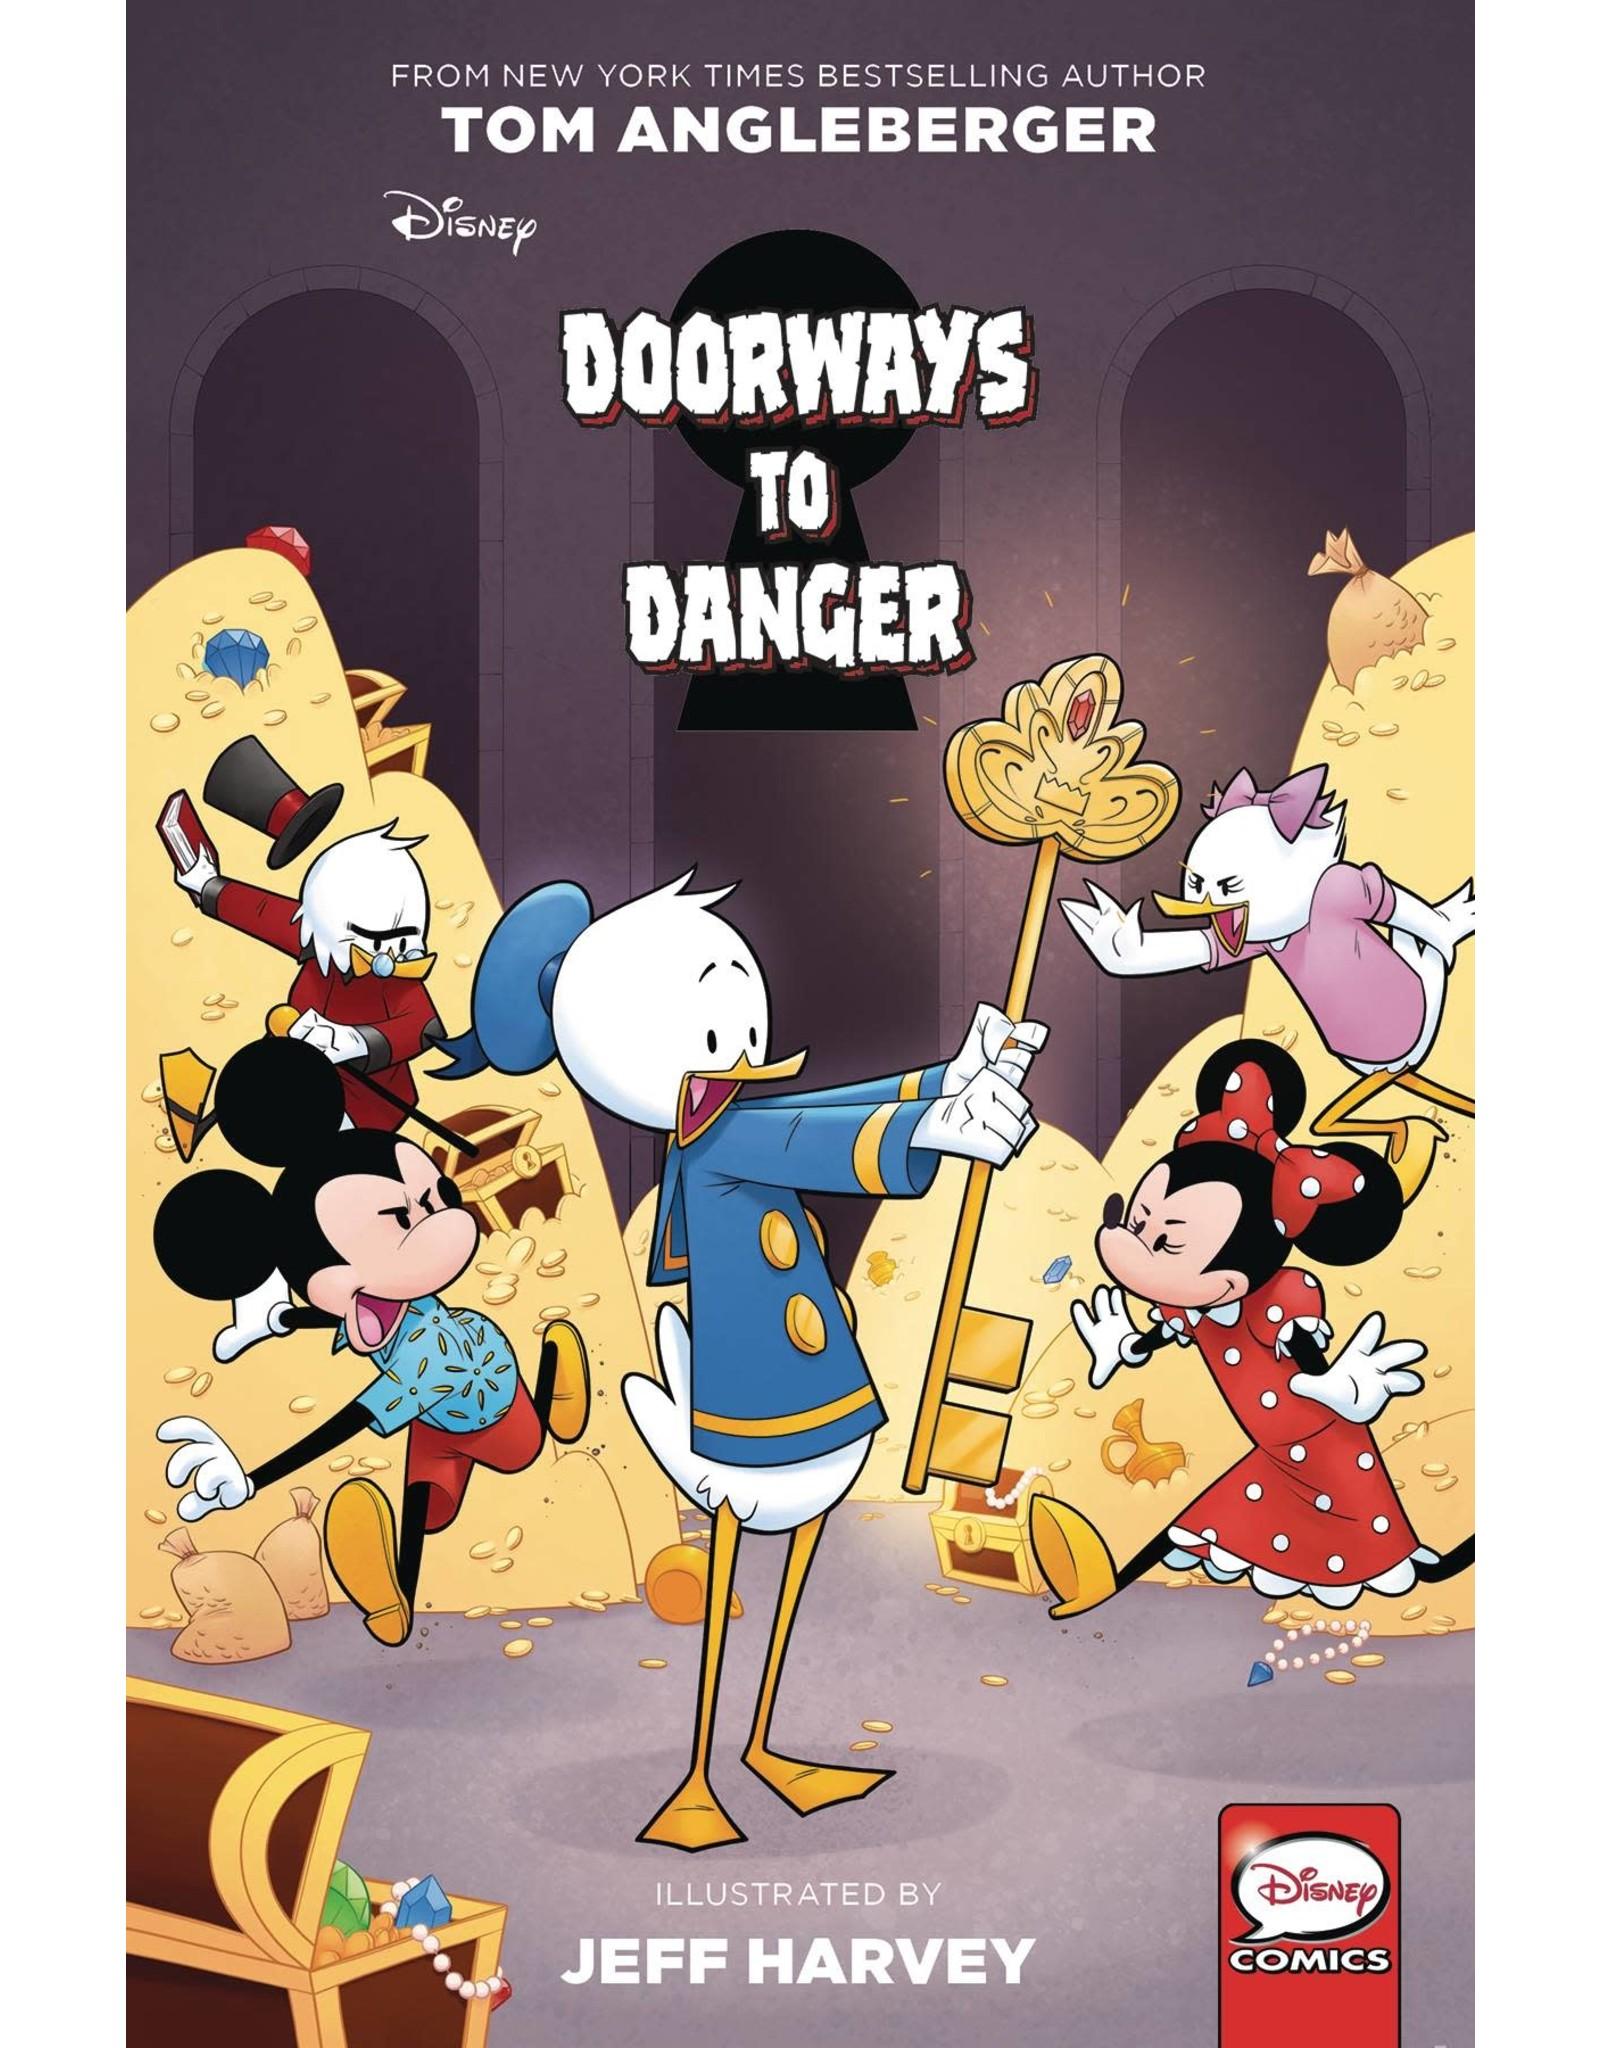 IDW PUBLISHING DISNEYS DOORWAYS TO DANGER GN